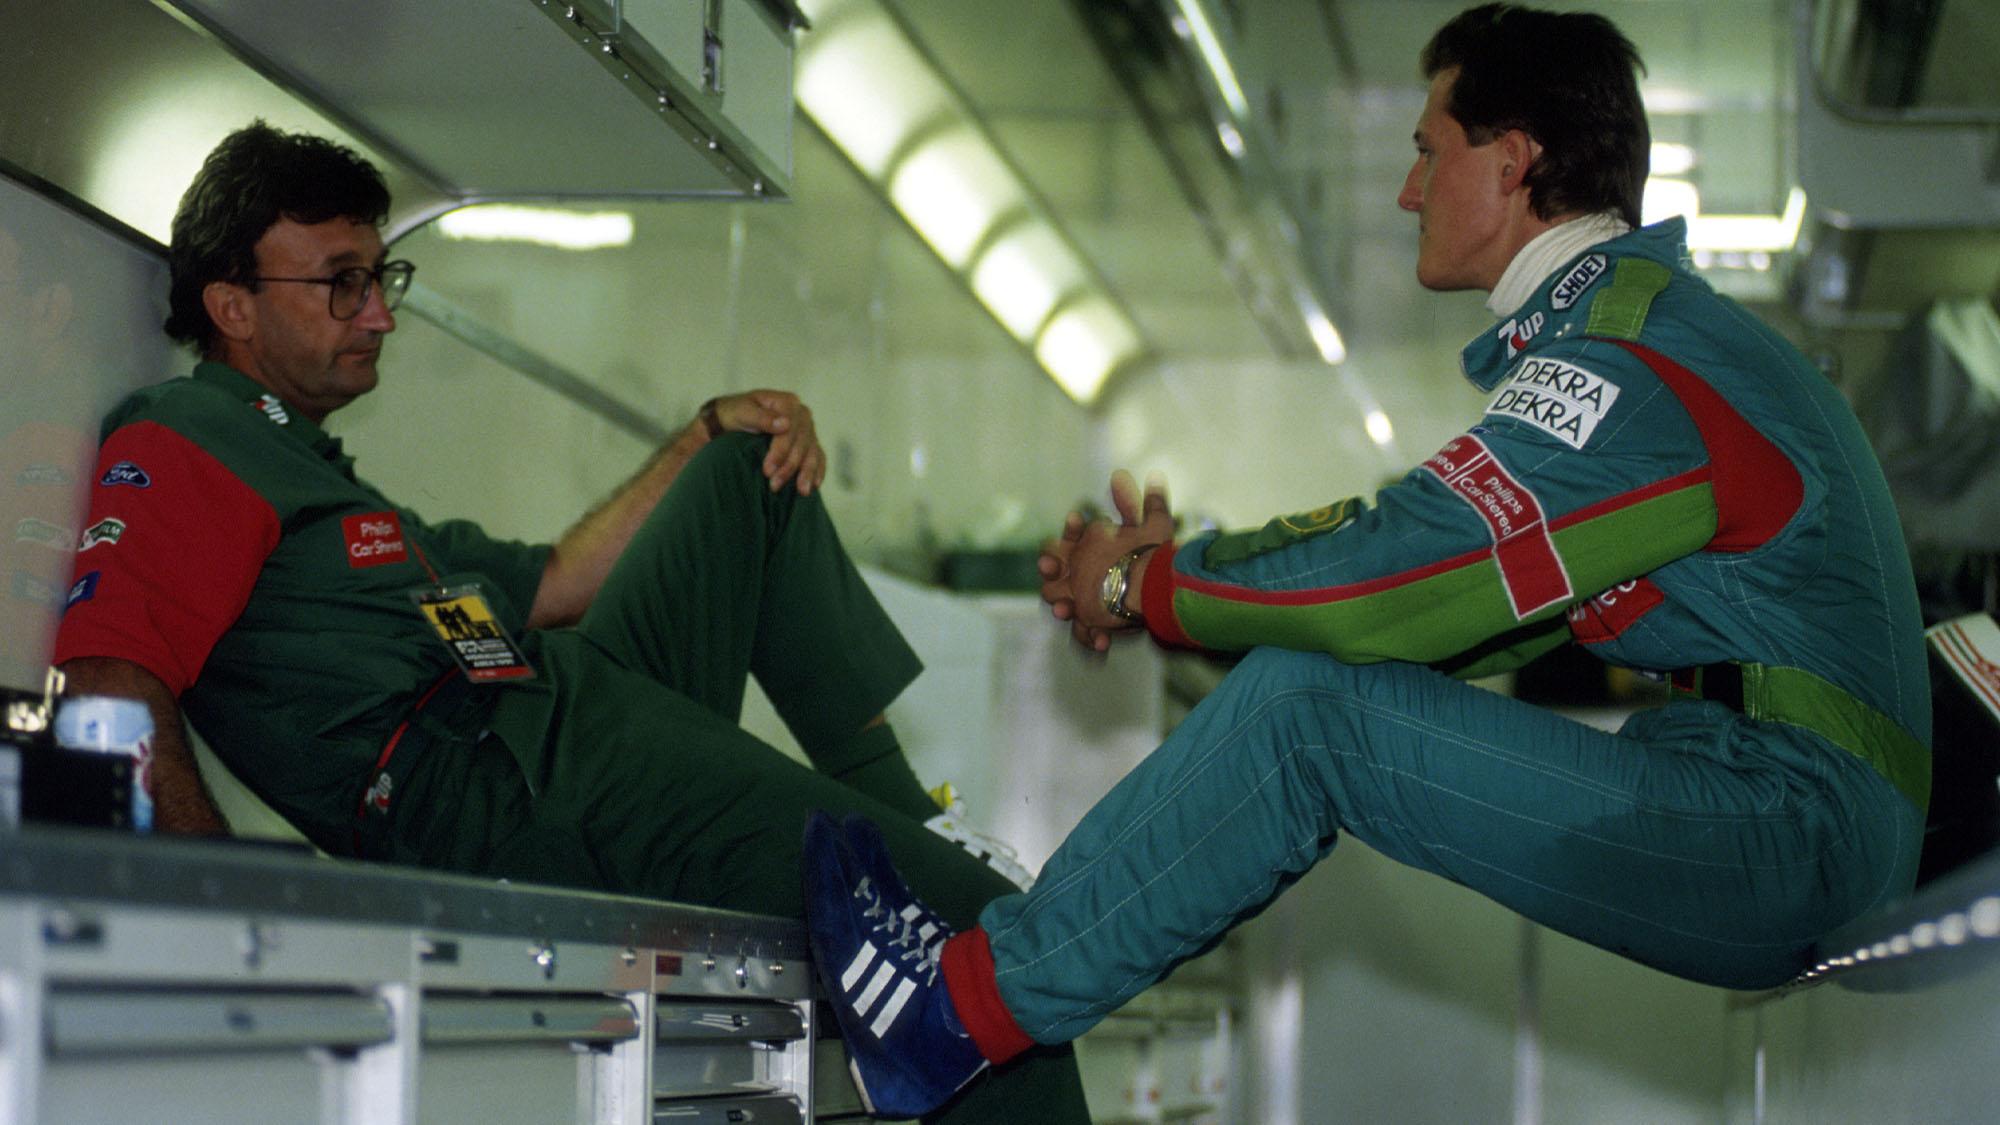 Formel 1, Grand Prix Belgien 1991, Spa-Francorchamps, 25.08.1991 Jordan-LKW Eddie Jordan Michael Schumacher www.hoch-zwei.net , copyright: HOCH ZWEI / Ronco (Photo by Hoch Zwei/Corbis via Getty Images)